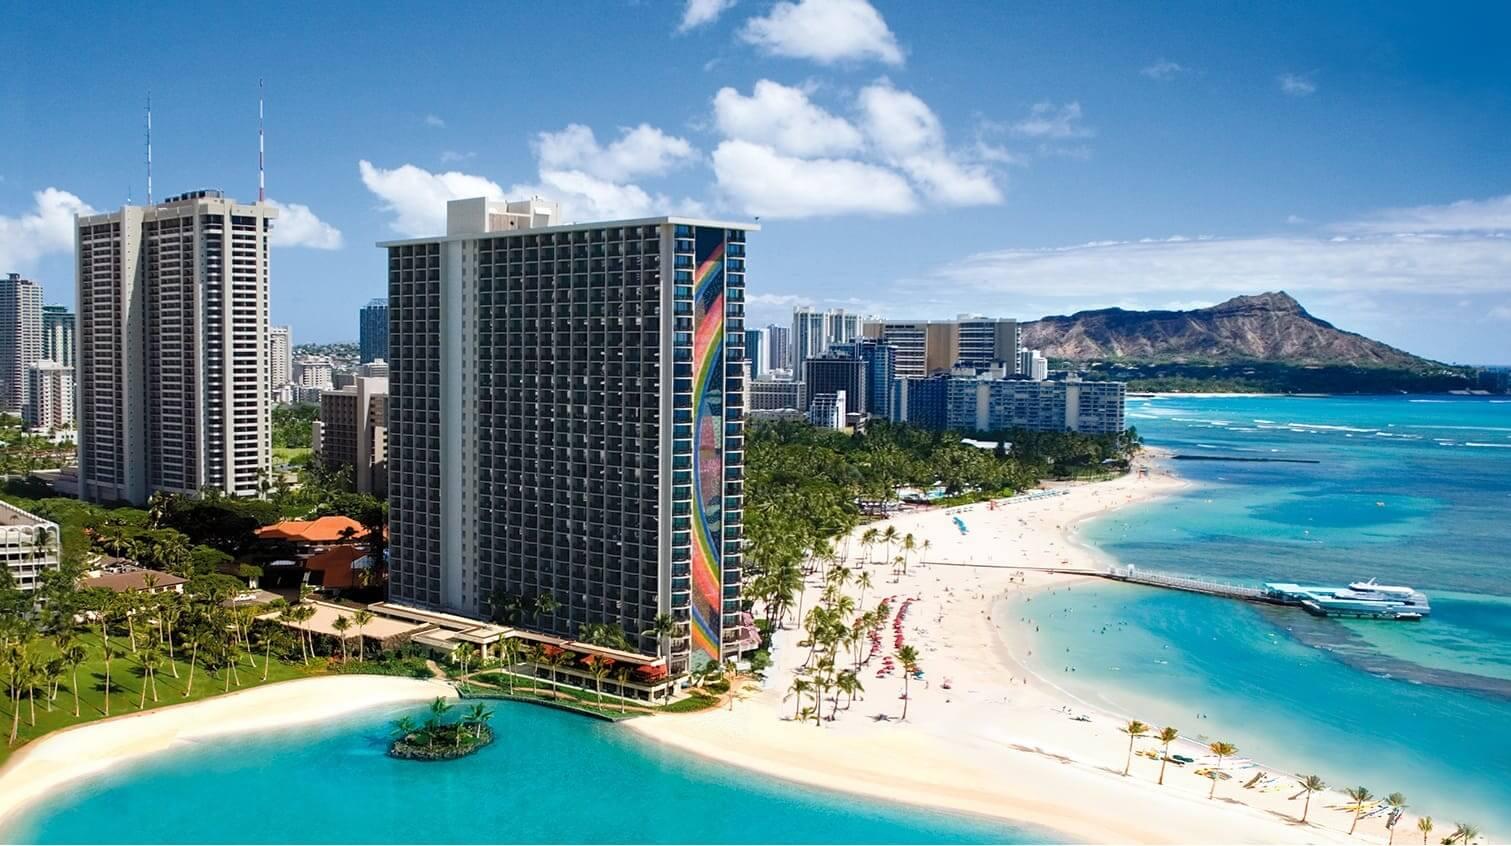 , Hilton Hawaiian Village hotel workers will vote on new union contract tomorrow, Buzz travel | eTurboNews |Travel News